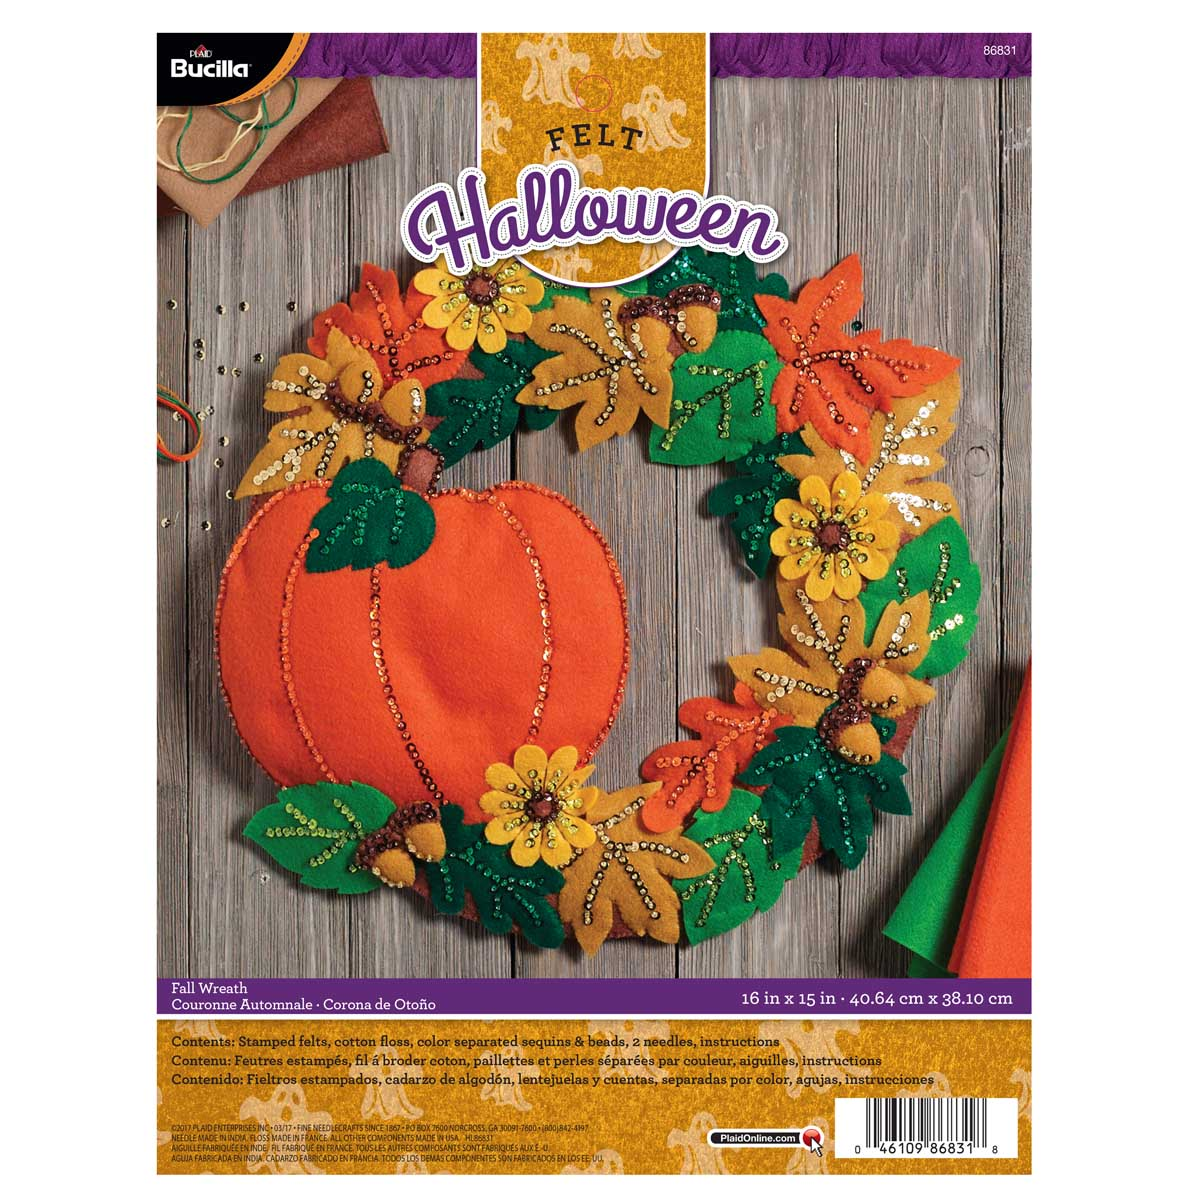 Bucilla ® Seasonal - Felt - Home Decor - Fall Wreath - 86831